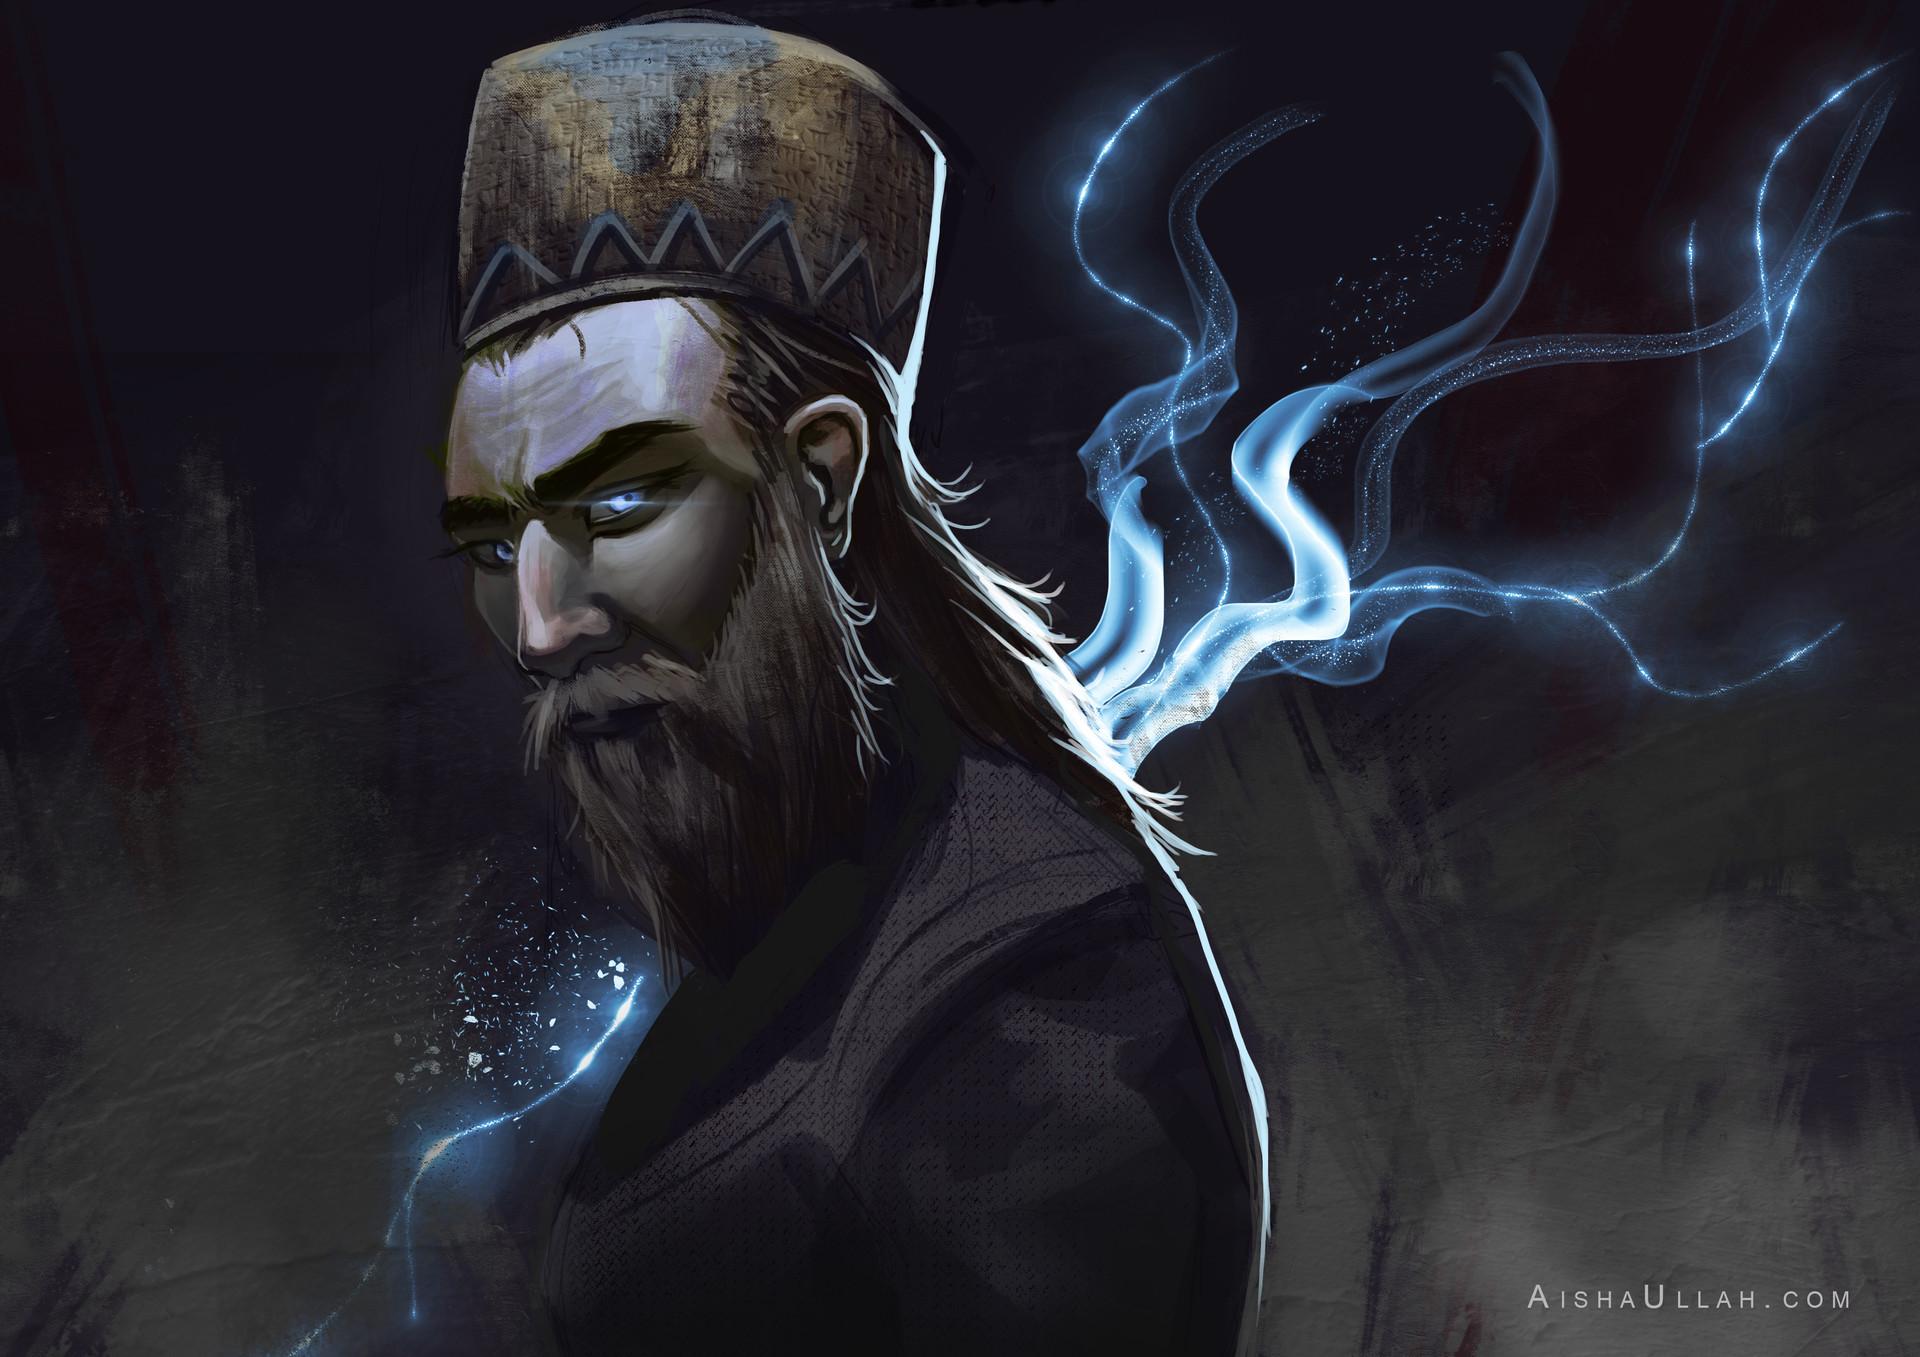 Aisha ullah sumeriangod